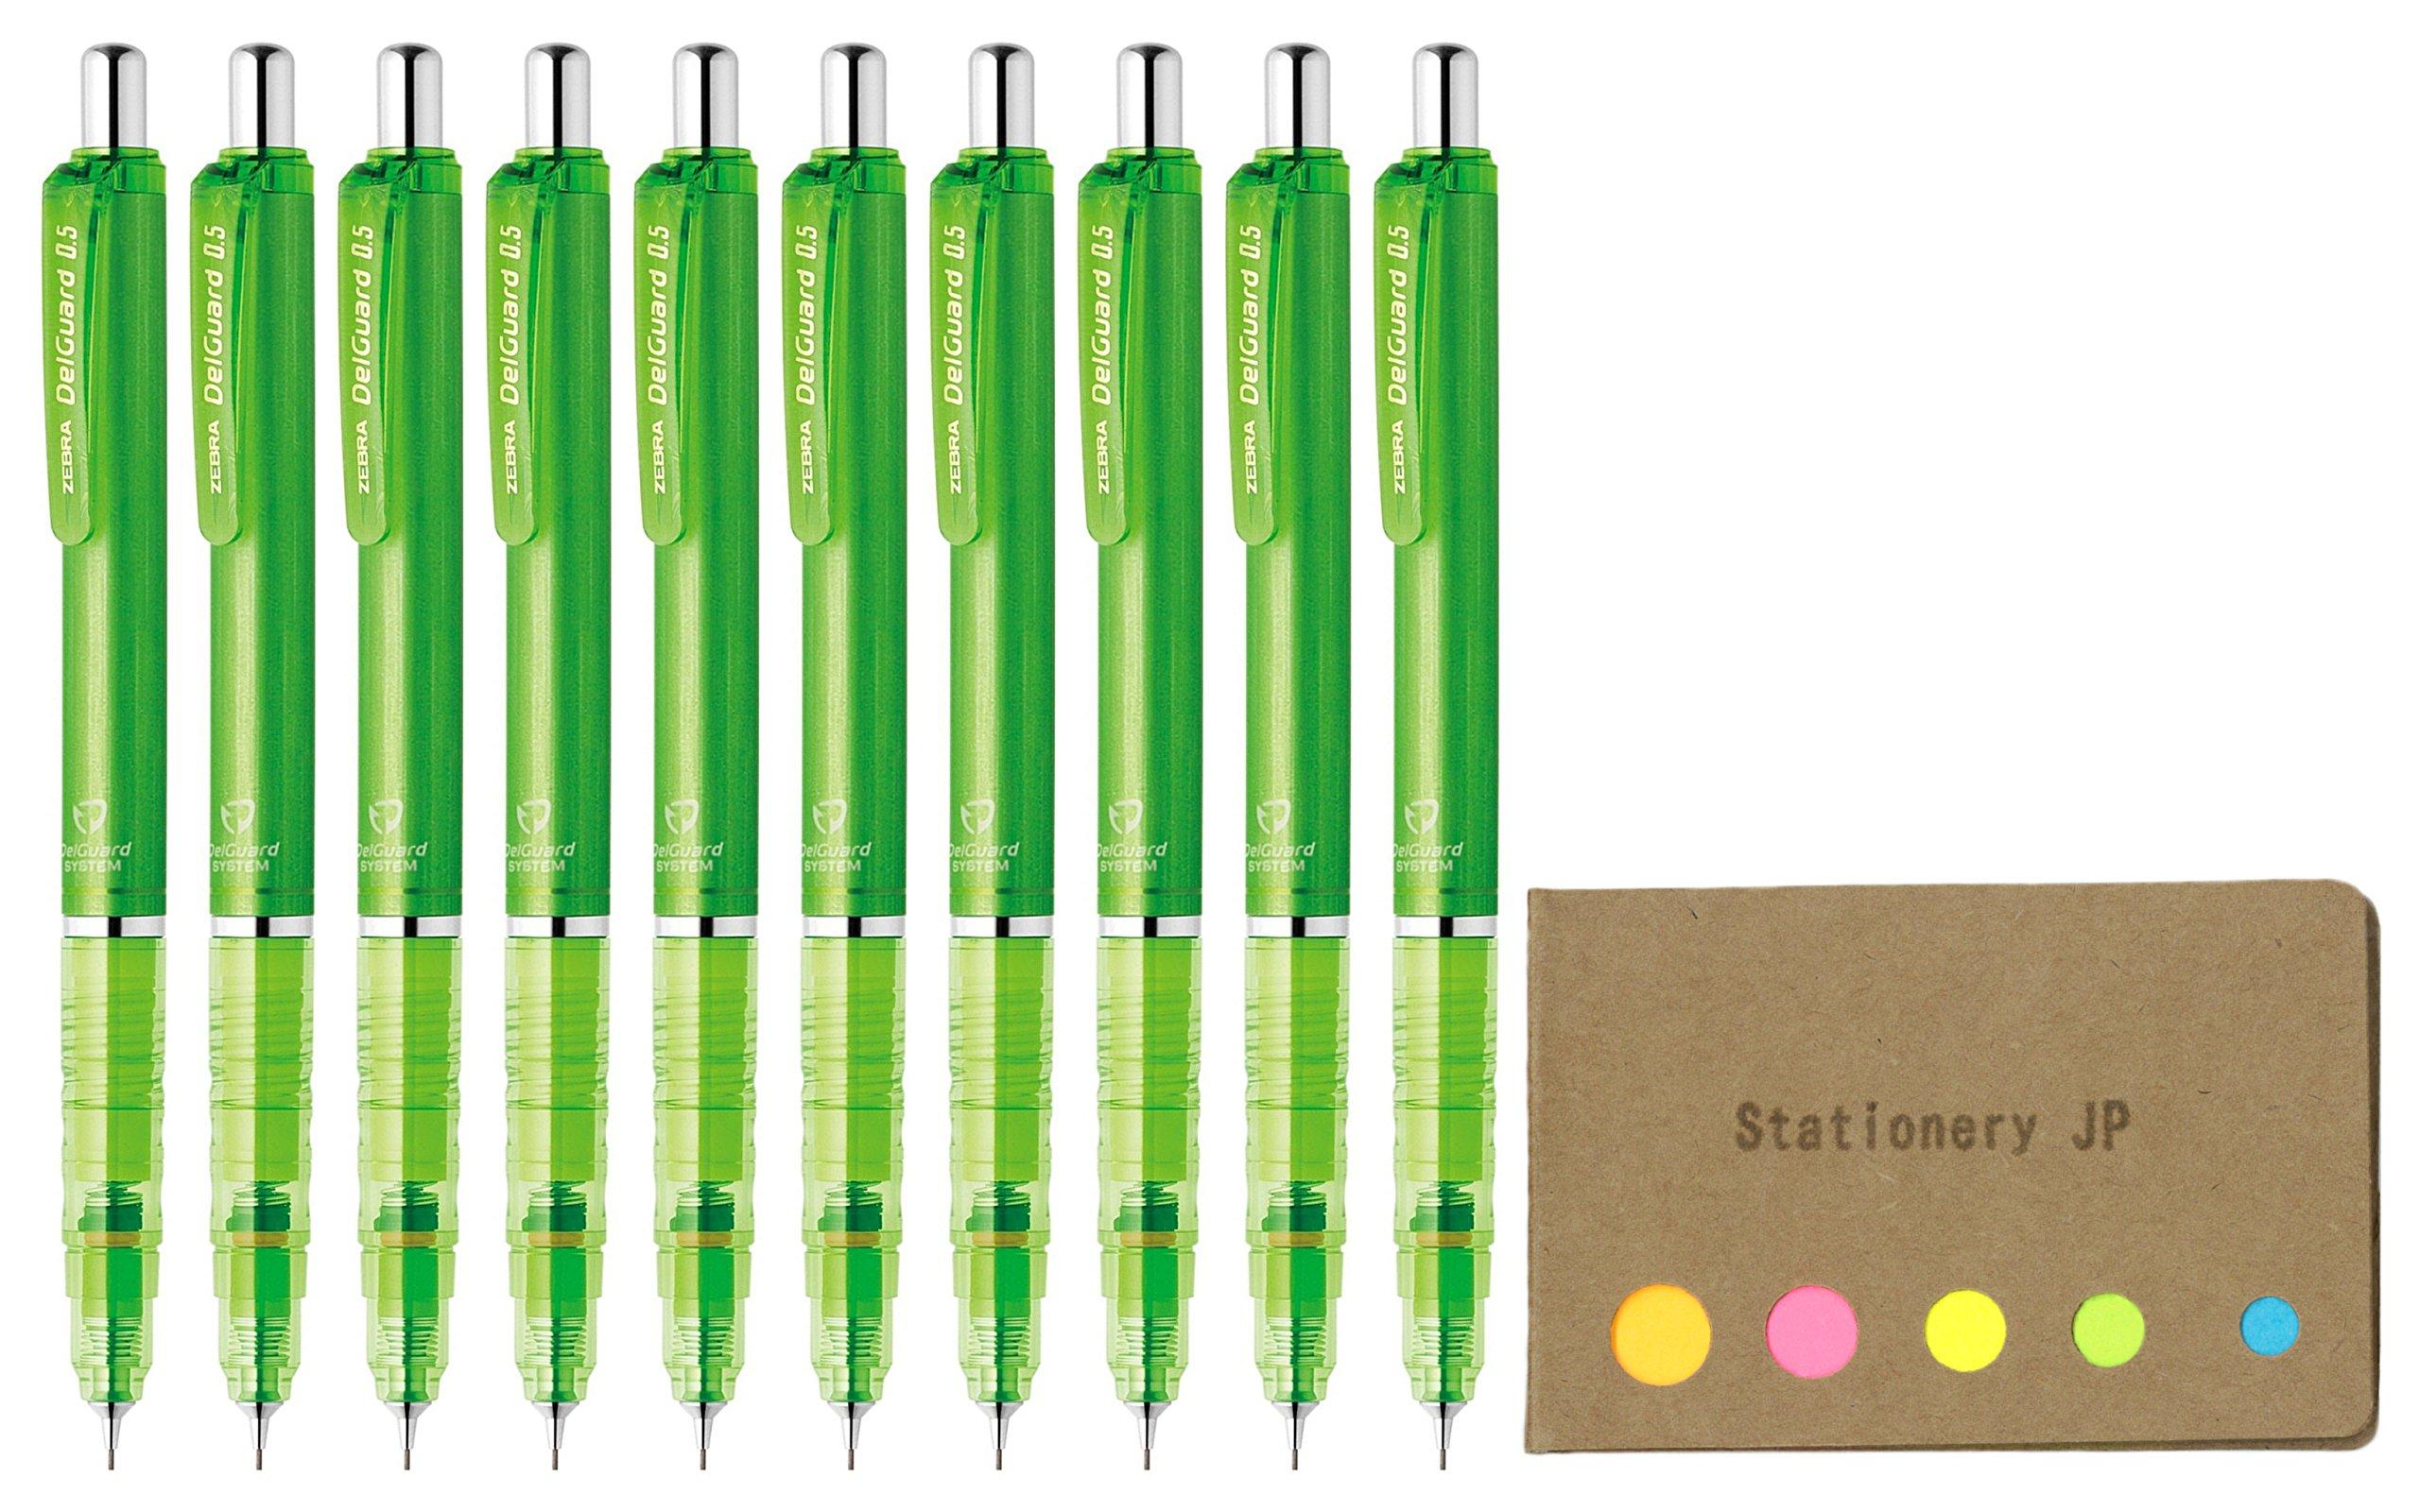 Zebra DelGuard Mechanical Pencil 0.5mm, Light Green Body, 10-pack, Sticky Notes Value Set